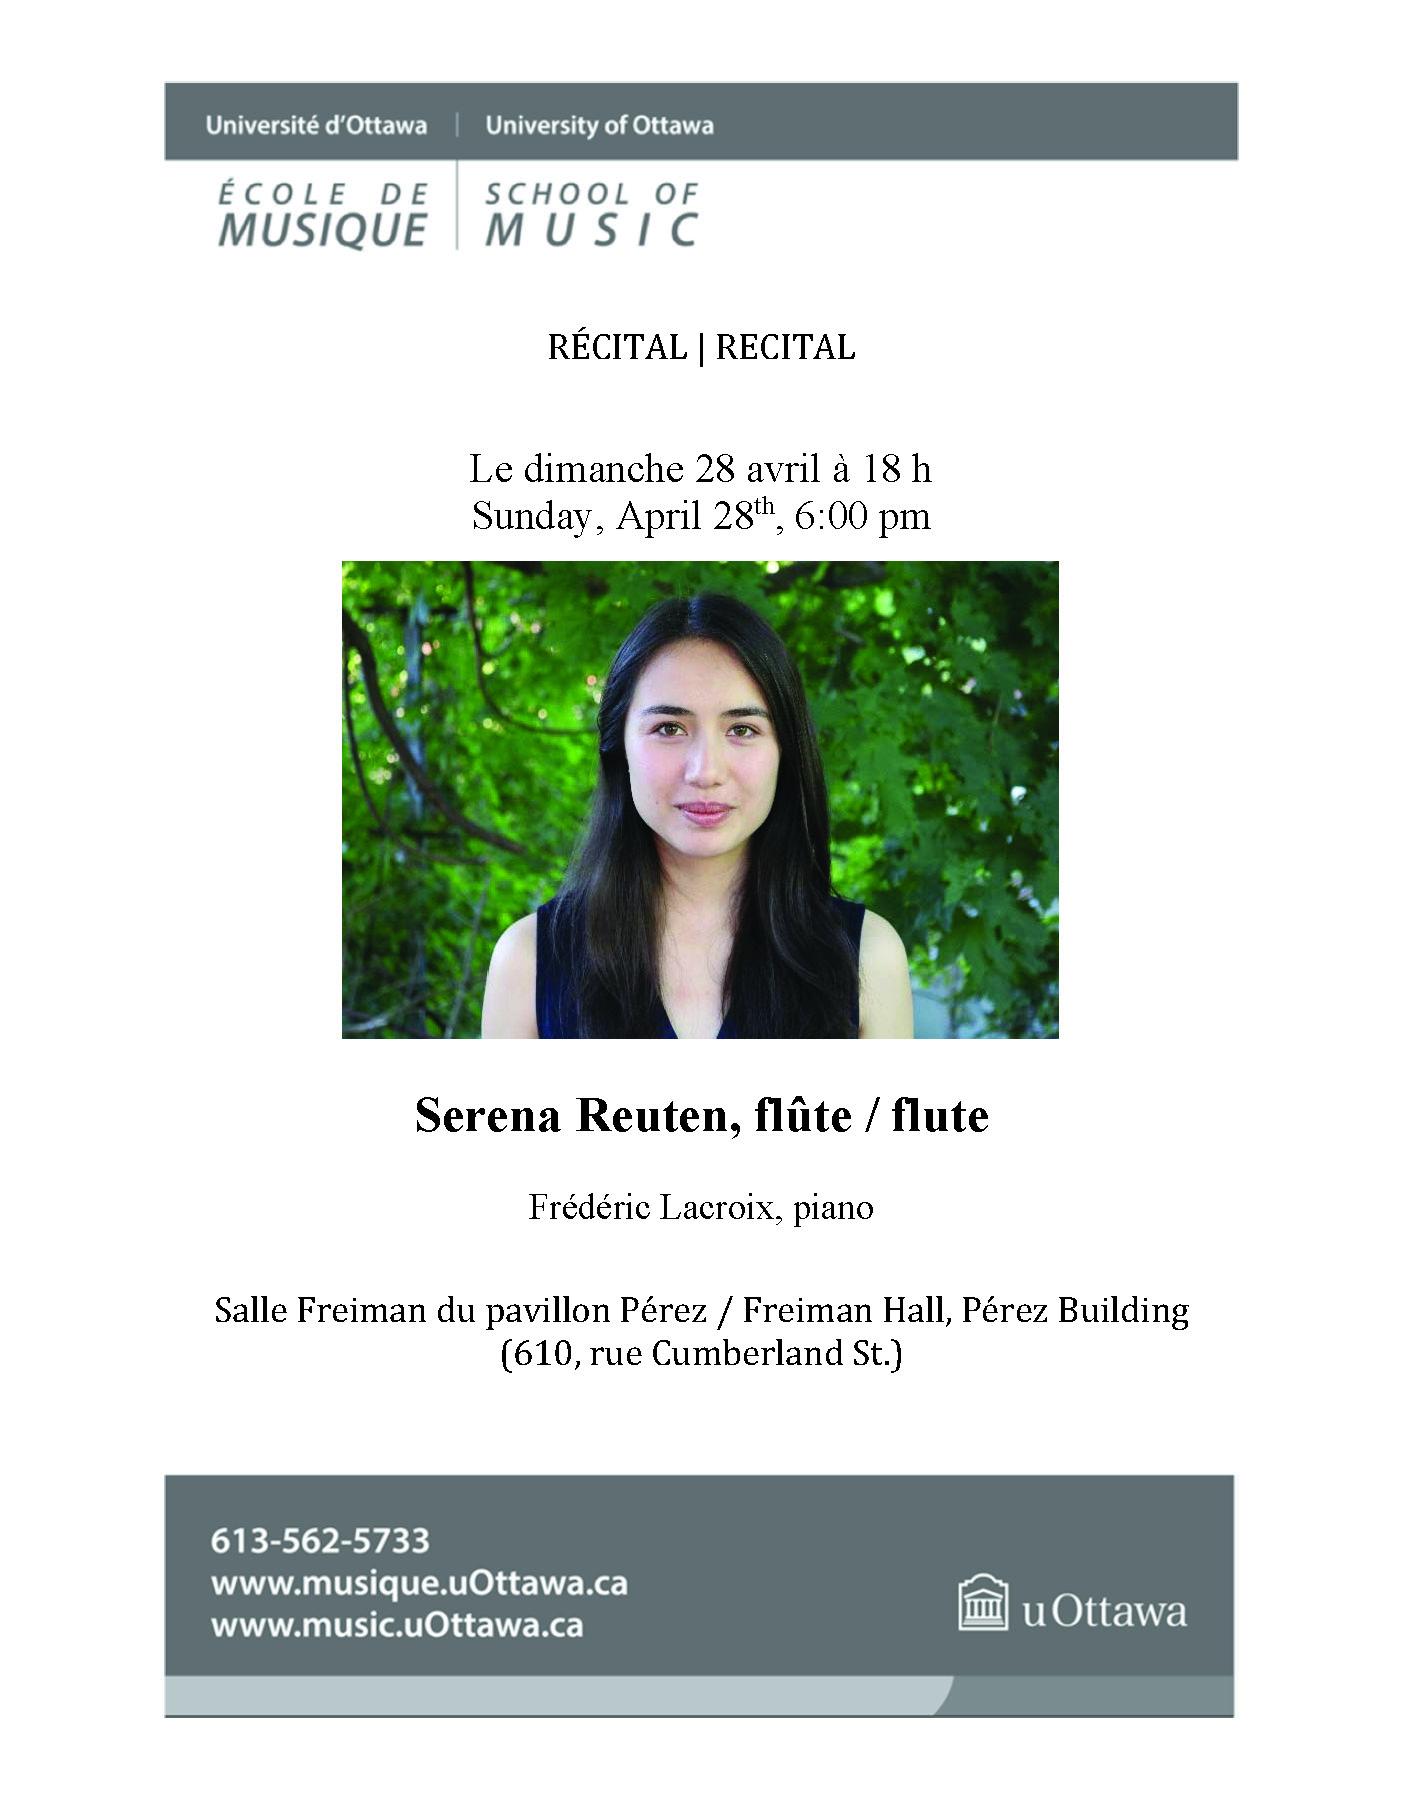 Recital program for Serena Reuten, page 1